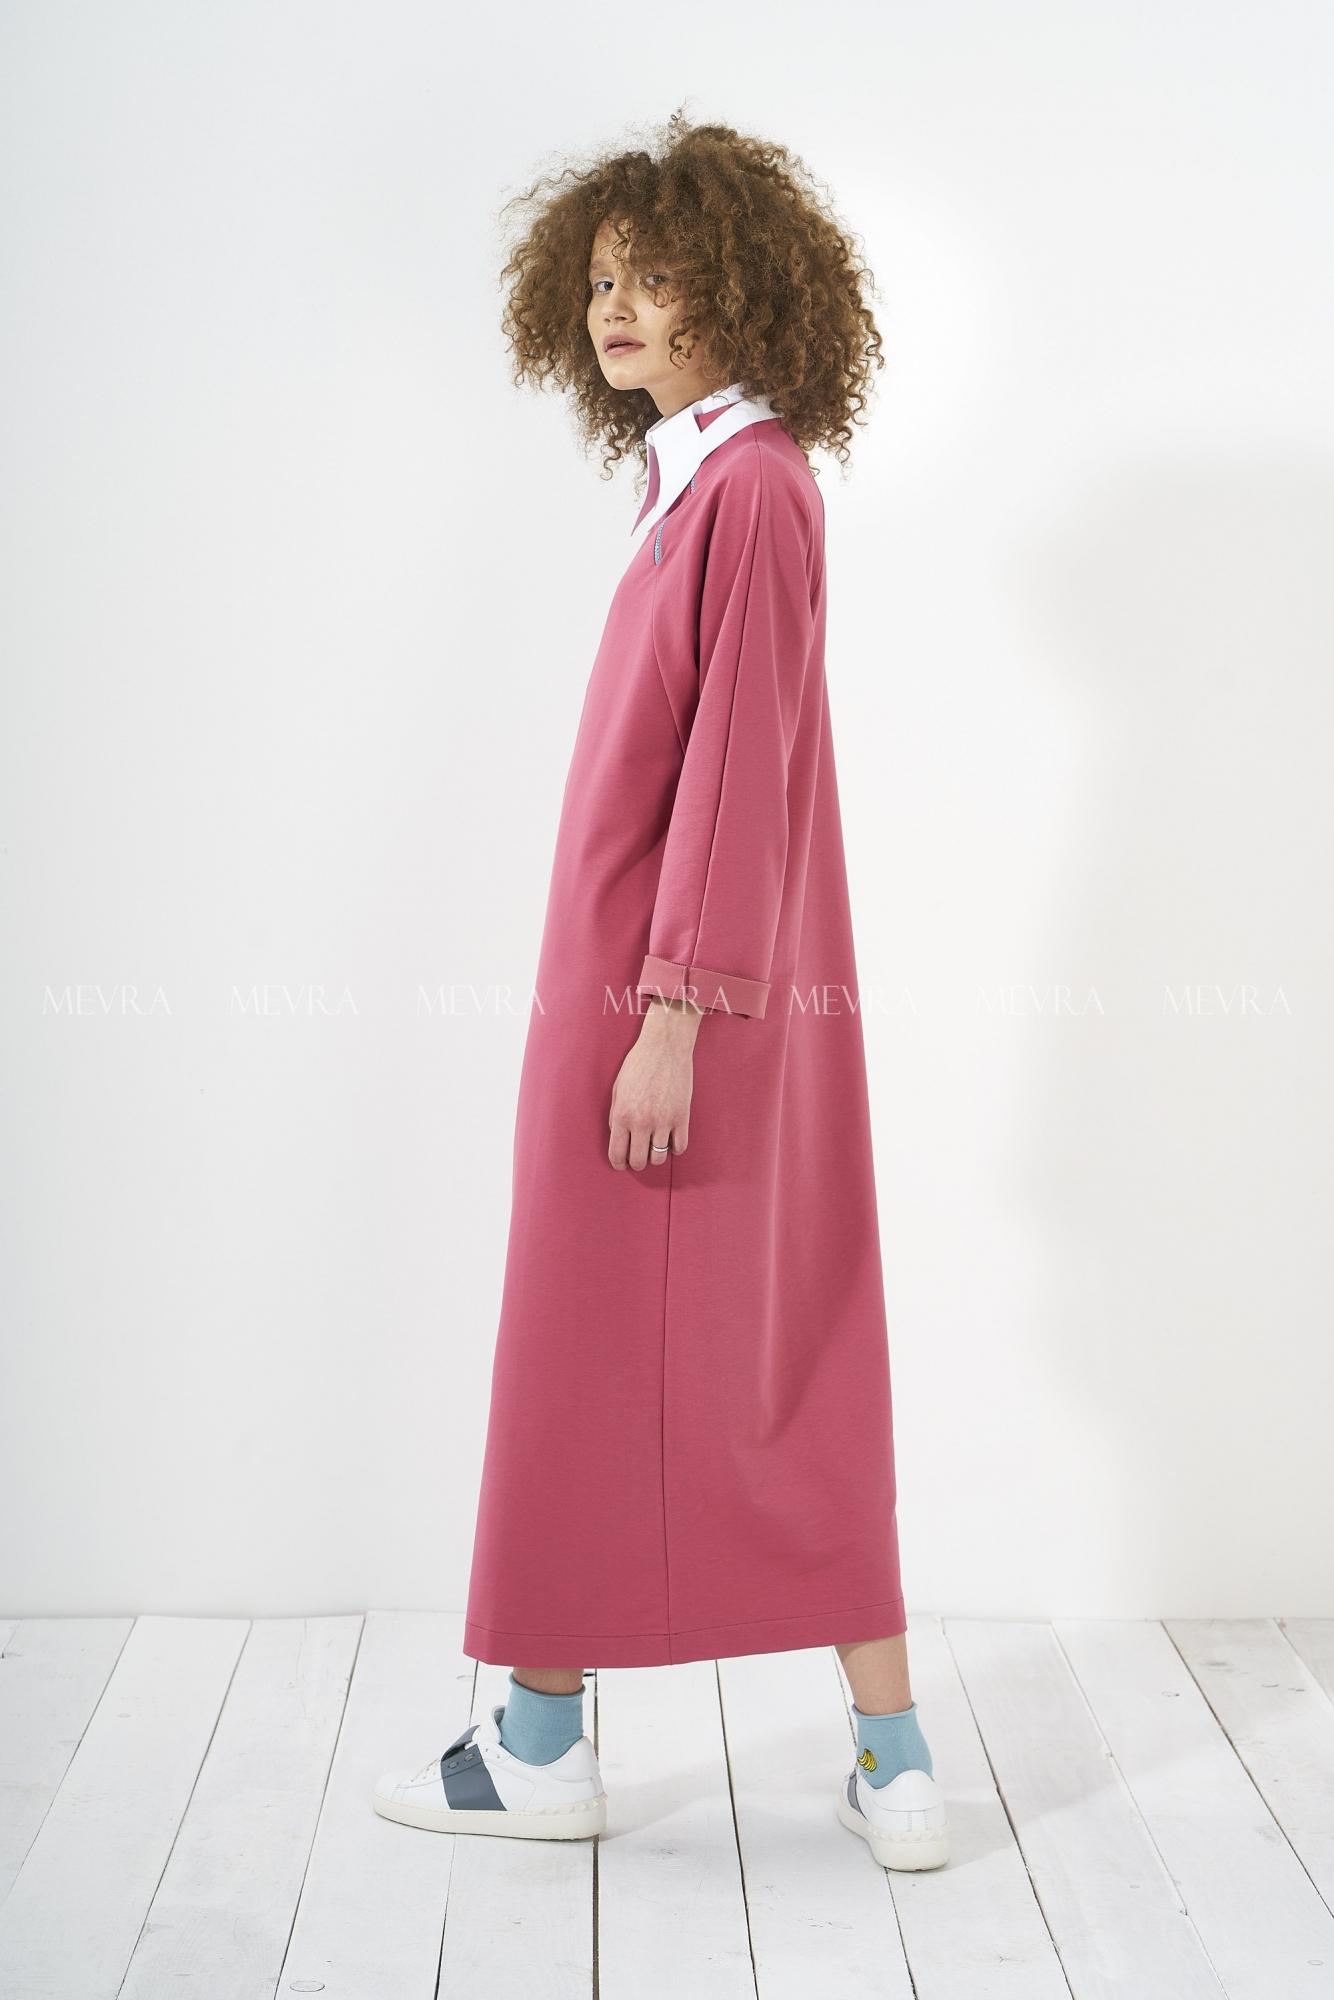 f5e62b444fd2e Uzun Elbiselerde Salaş Tasarımlar - Mevra.com.tr